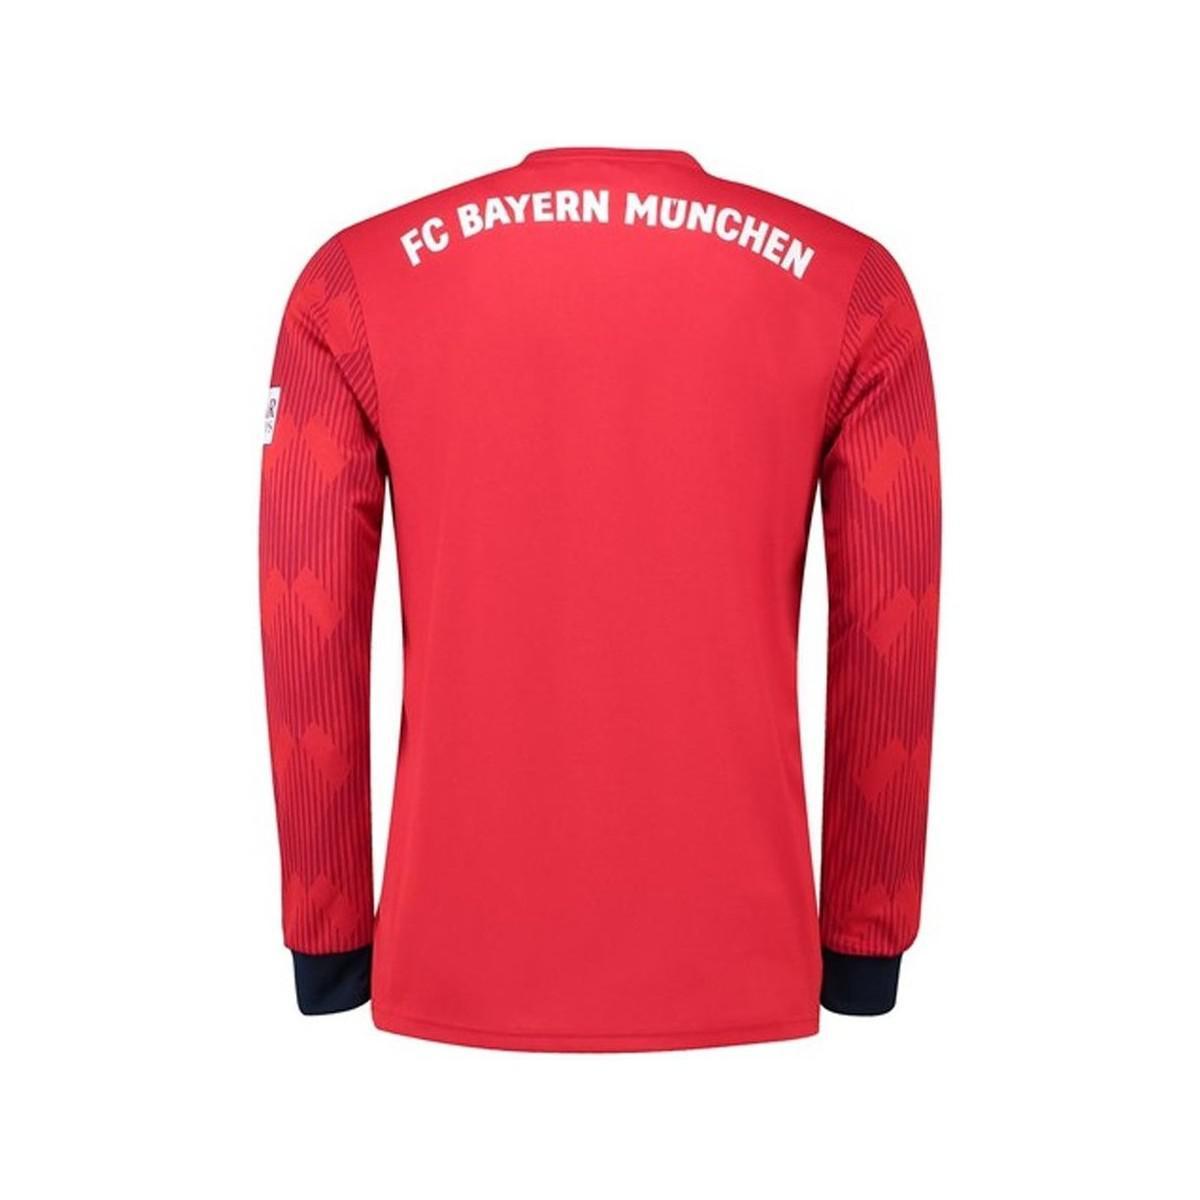 a4e1a3527b8 adidas 2018-2019 Bayern Munich Home Long Sleeve Shirt Men's In Red ...